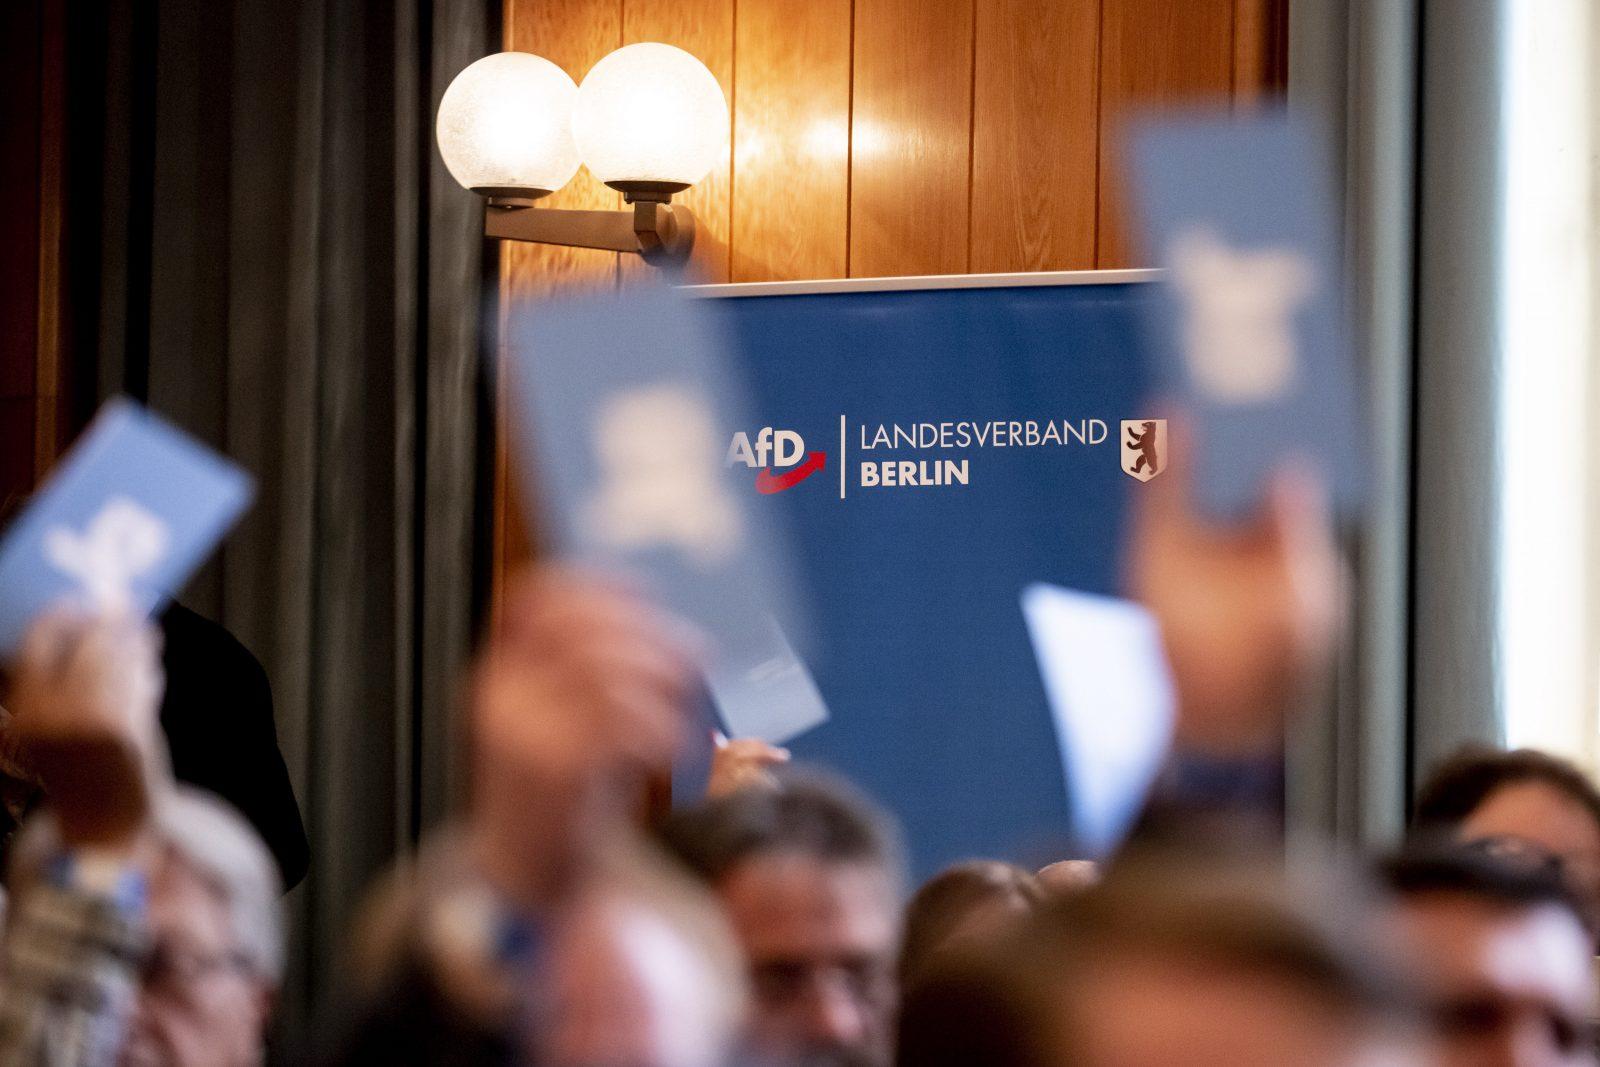 Parteitag der AfD Berlin 2019